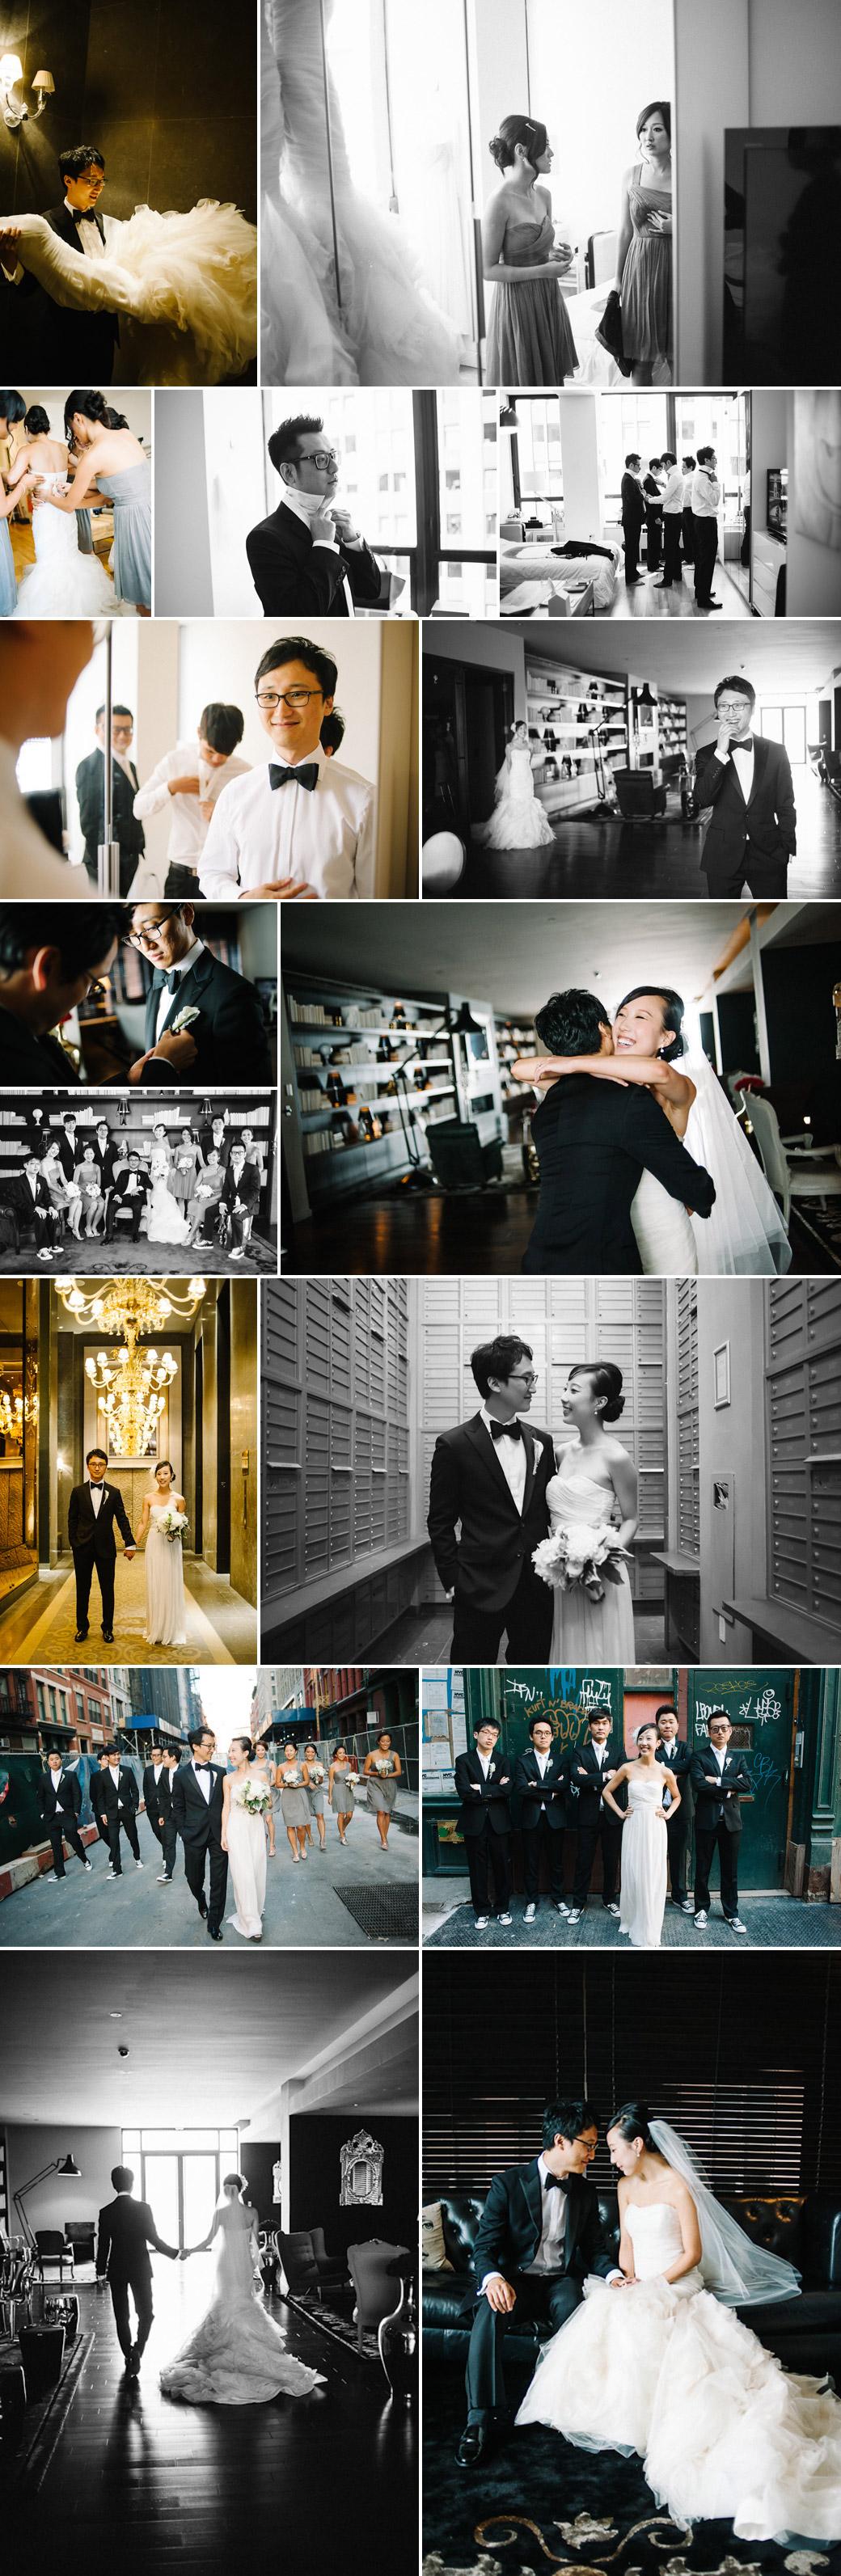 Collage-TriBeCa-NYC-Jungsik-Wedding-01.jpg